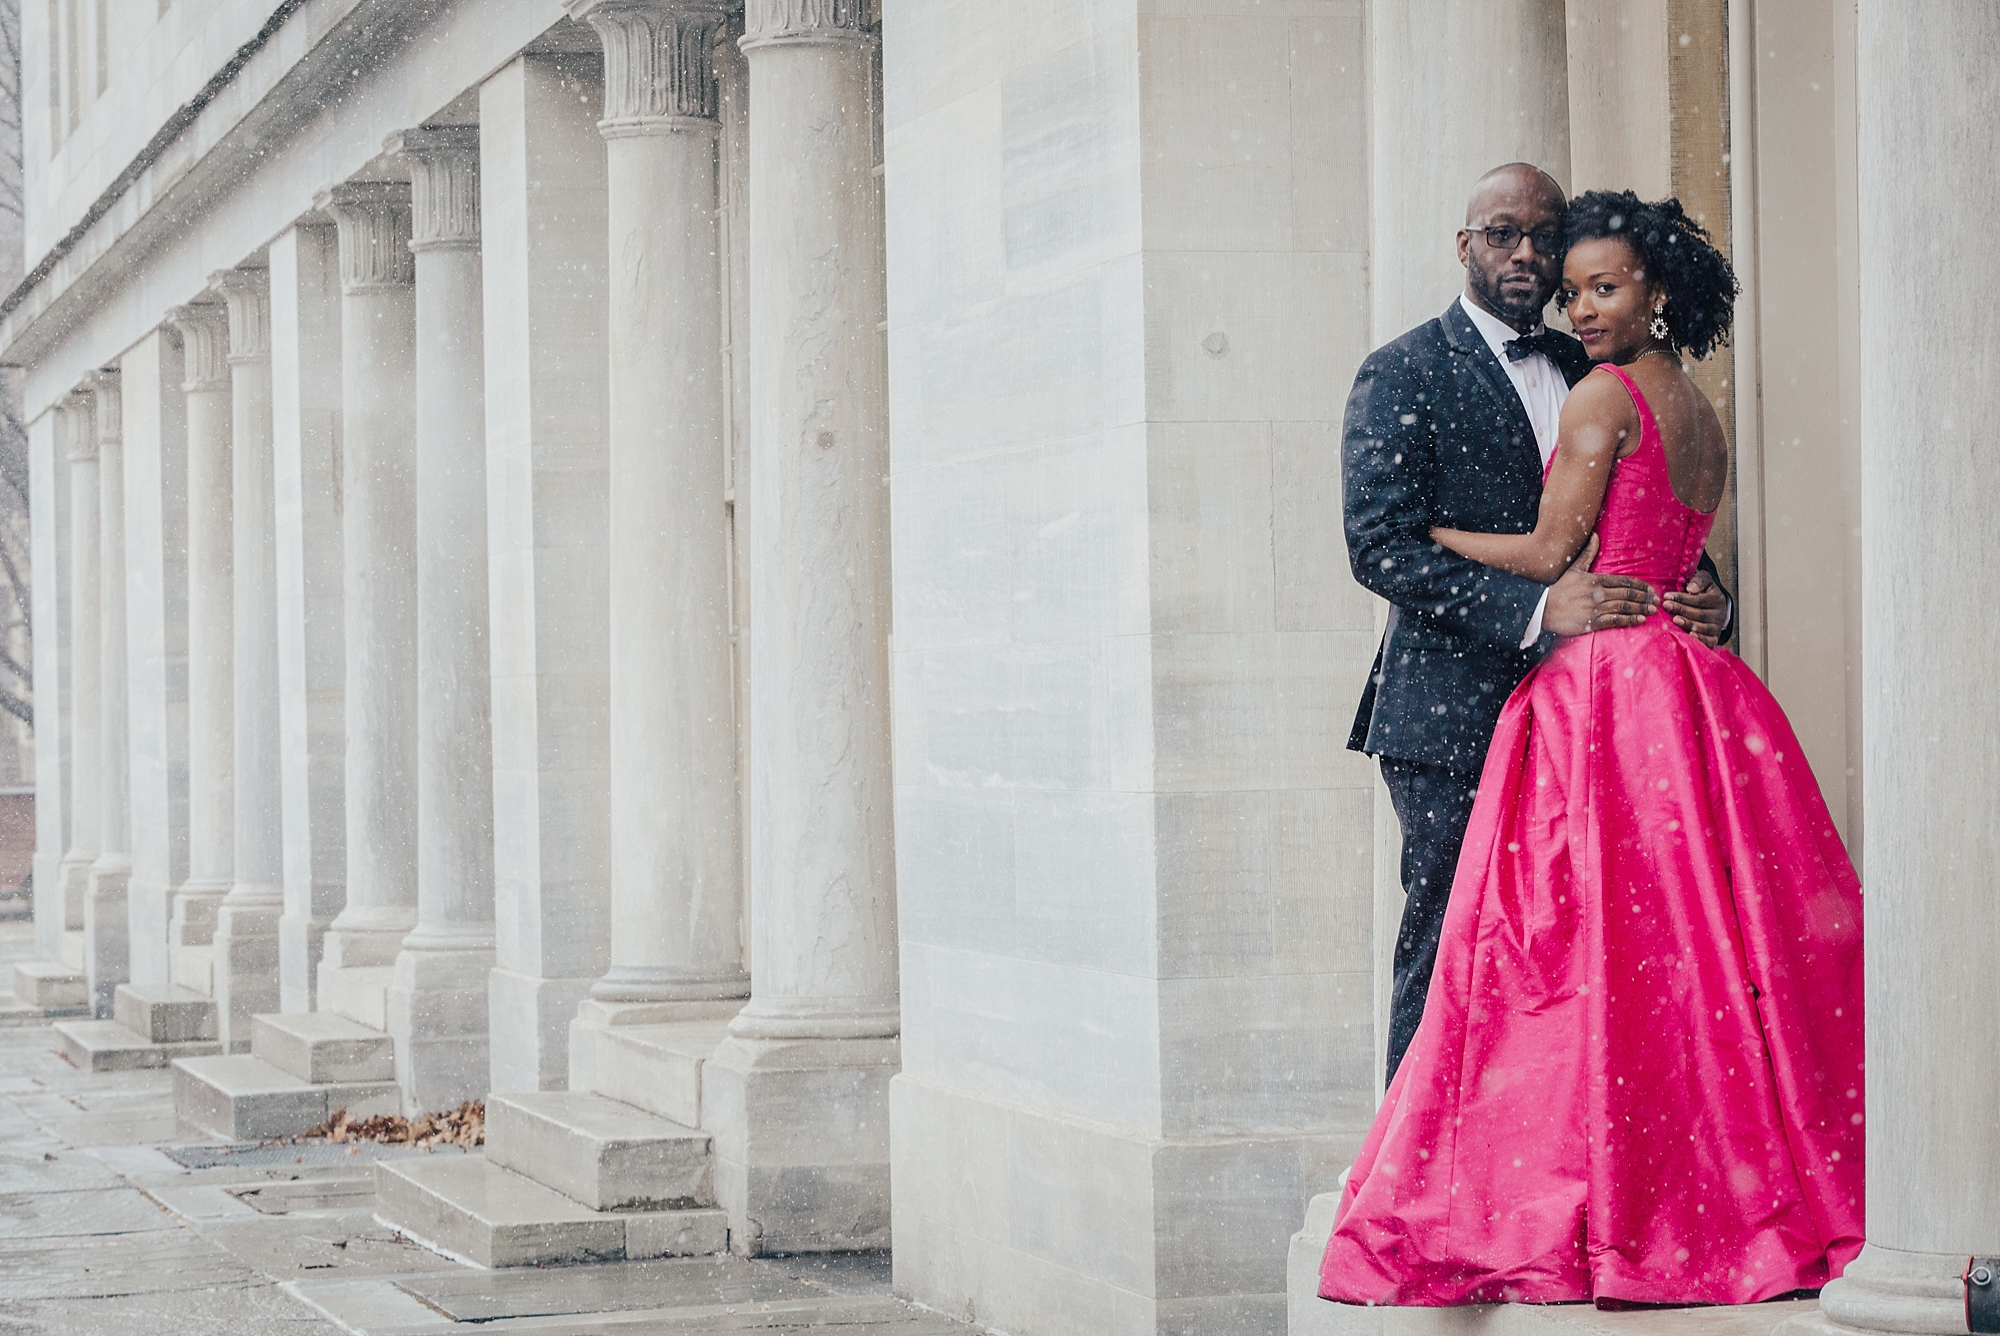 Joe_Mac_Creative_Vida_Fashionista_BHLDN_Bridal_Wedding_Fashion__0019.jpg